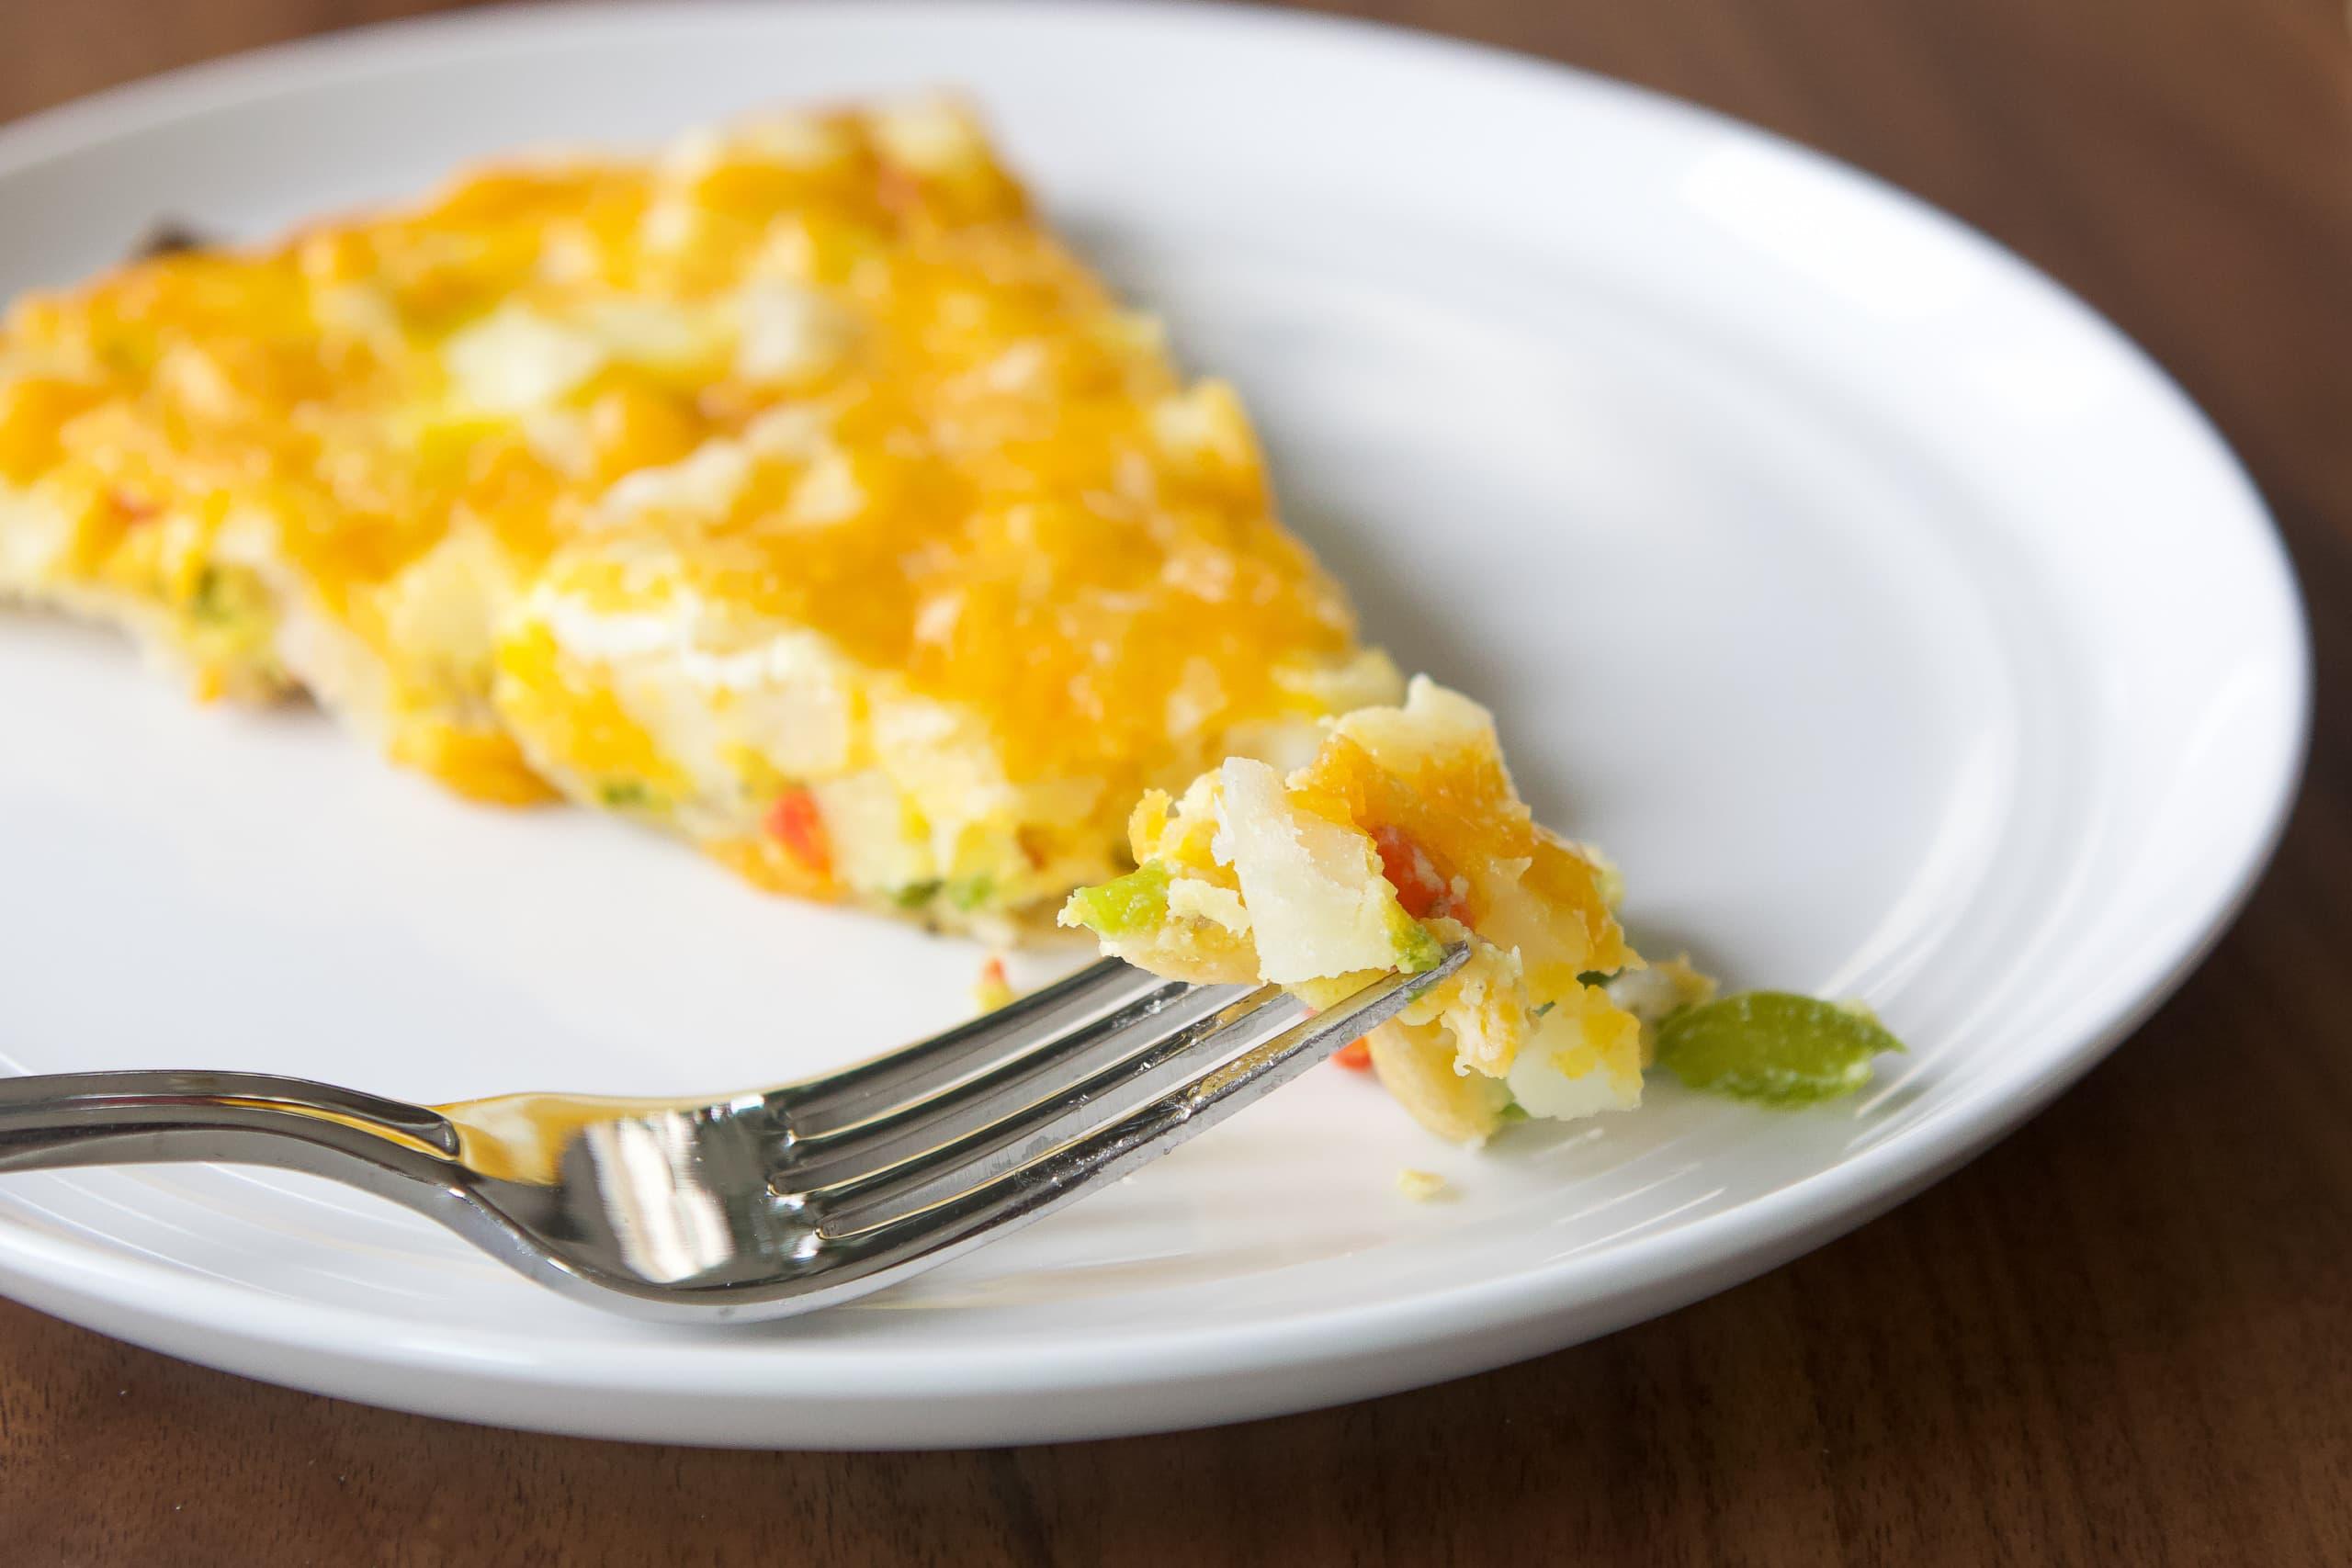 How to make cheesy breakfast pizza